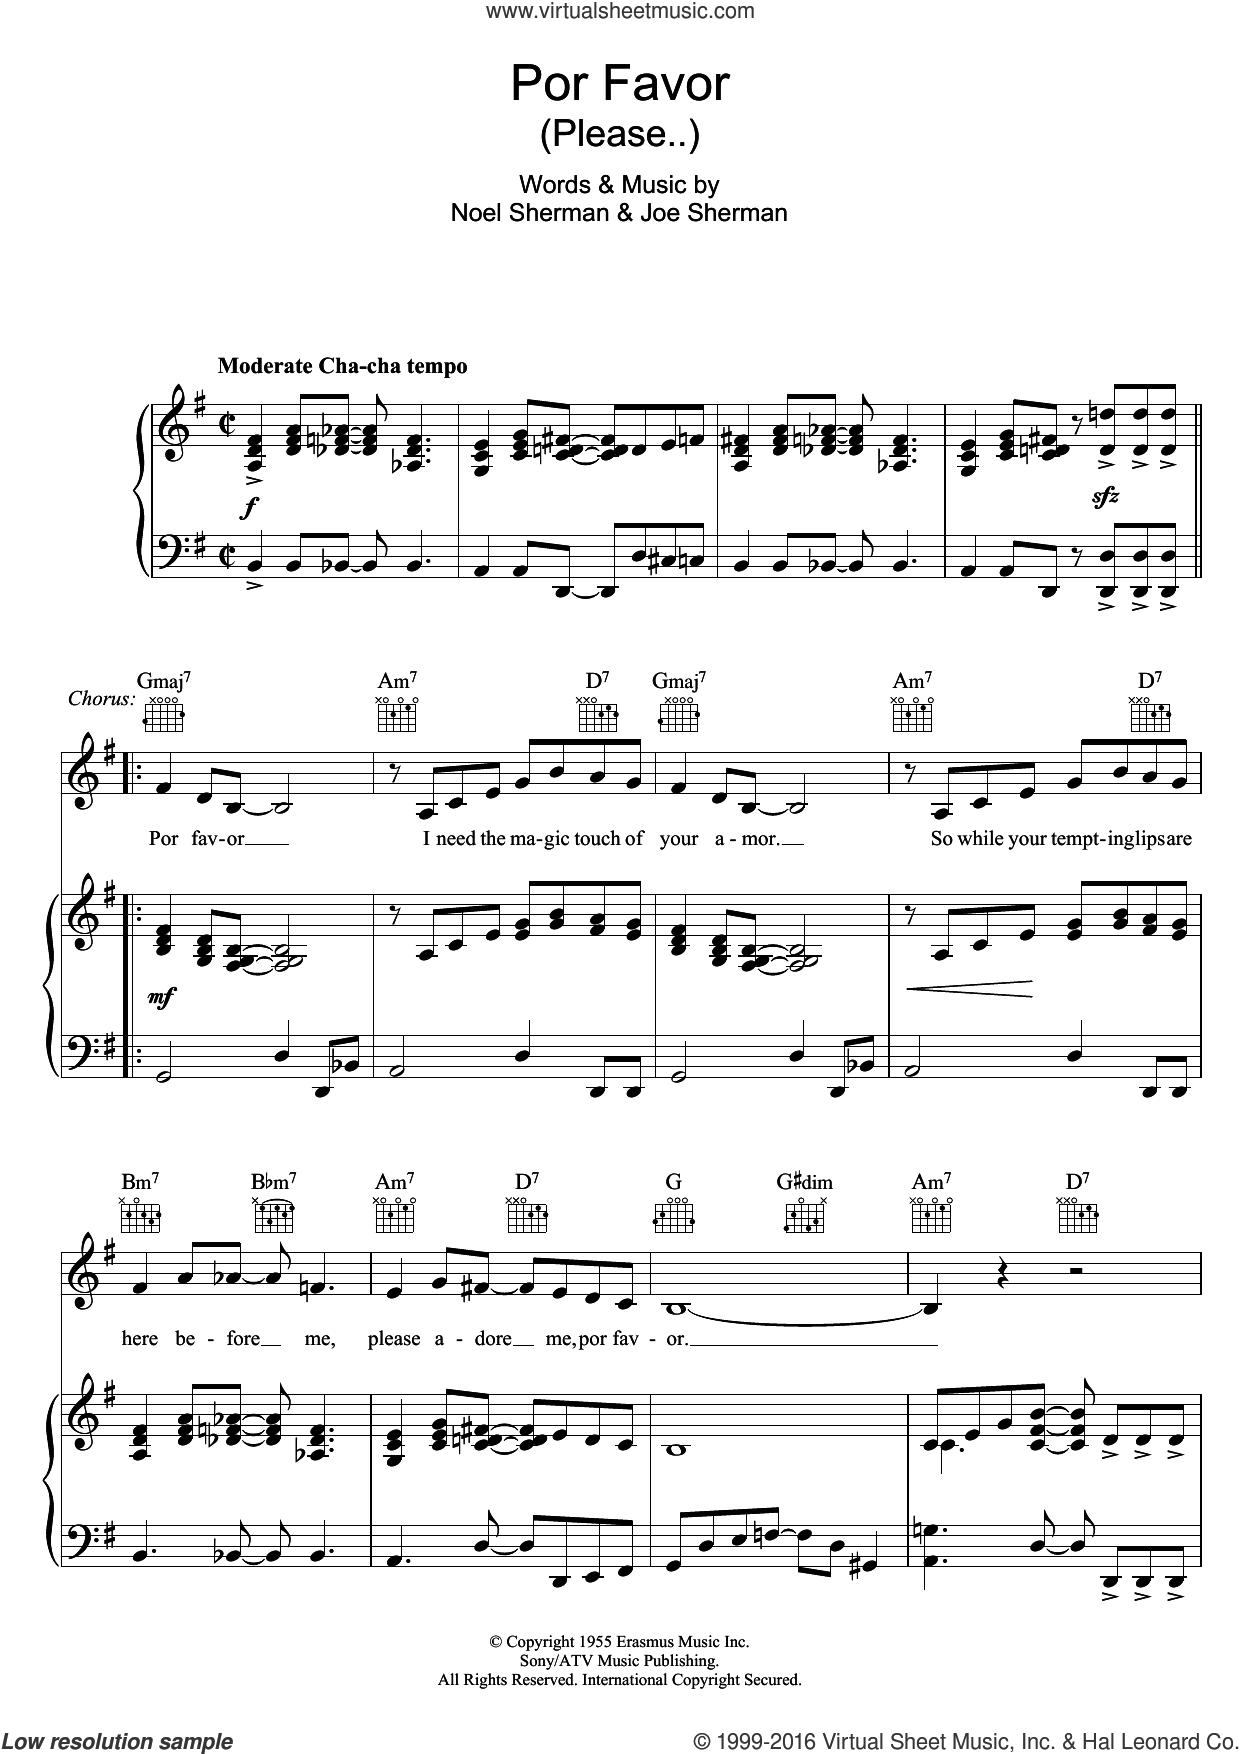 Por Favor sheet music for voice, piano or guitar by Doris Day, Joe Sherman and Noel Sherman, intermediate skill level